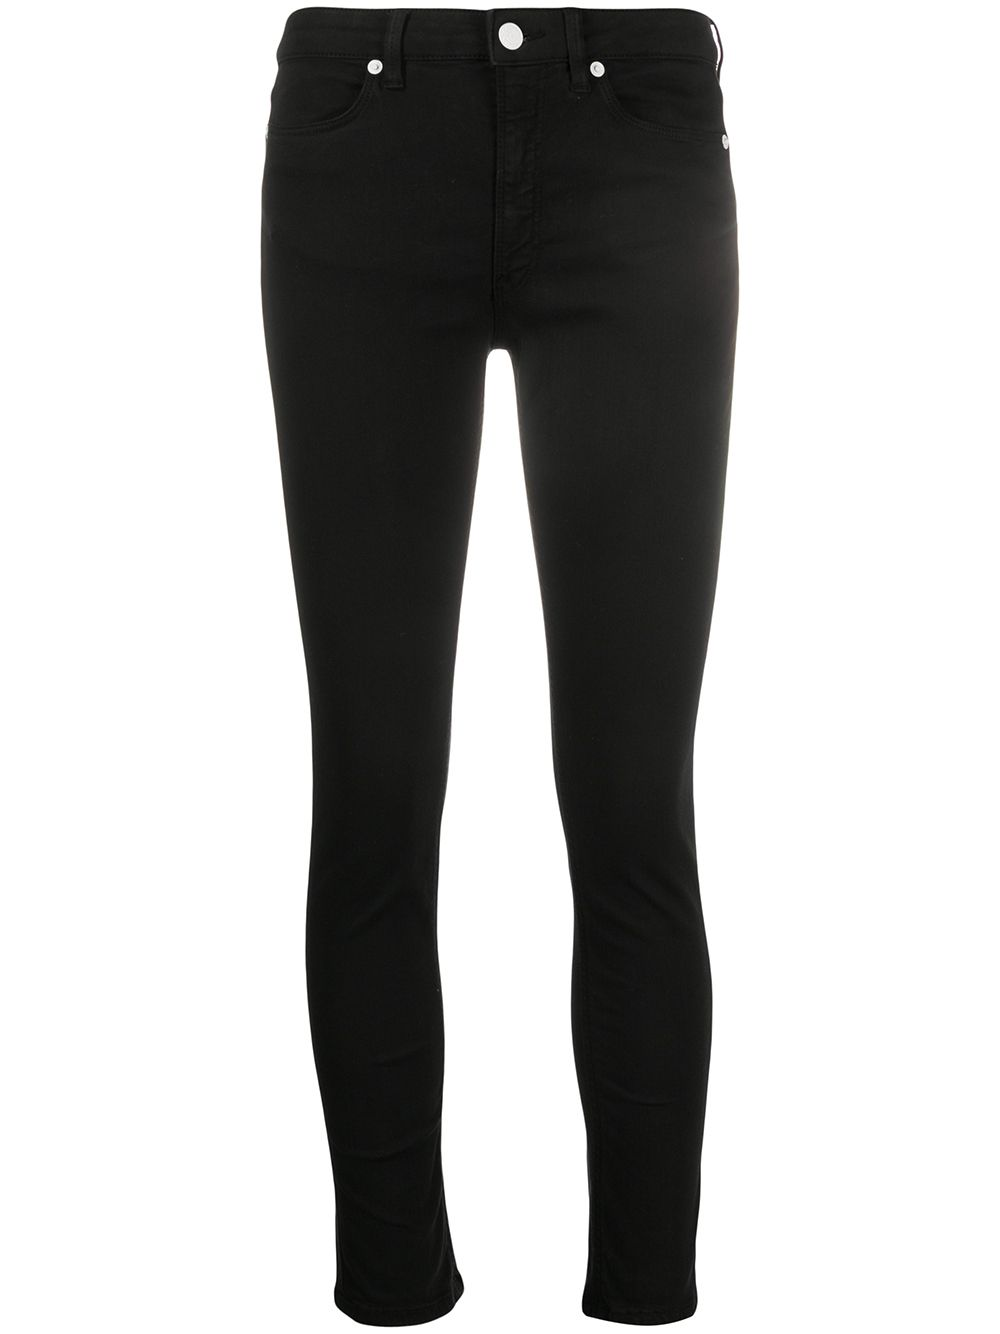 Iris Trousers